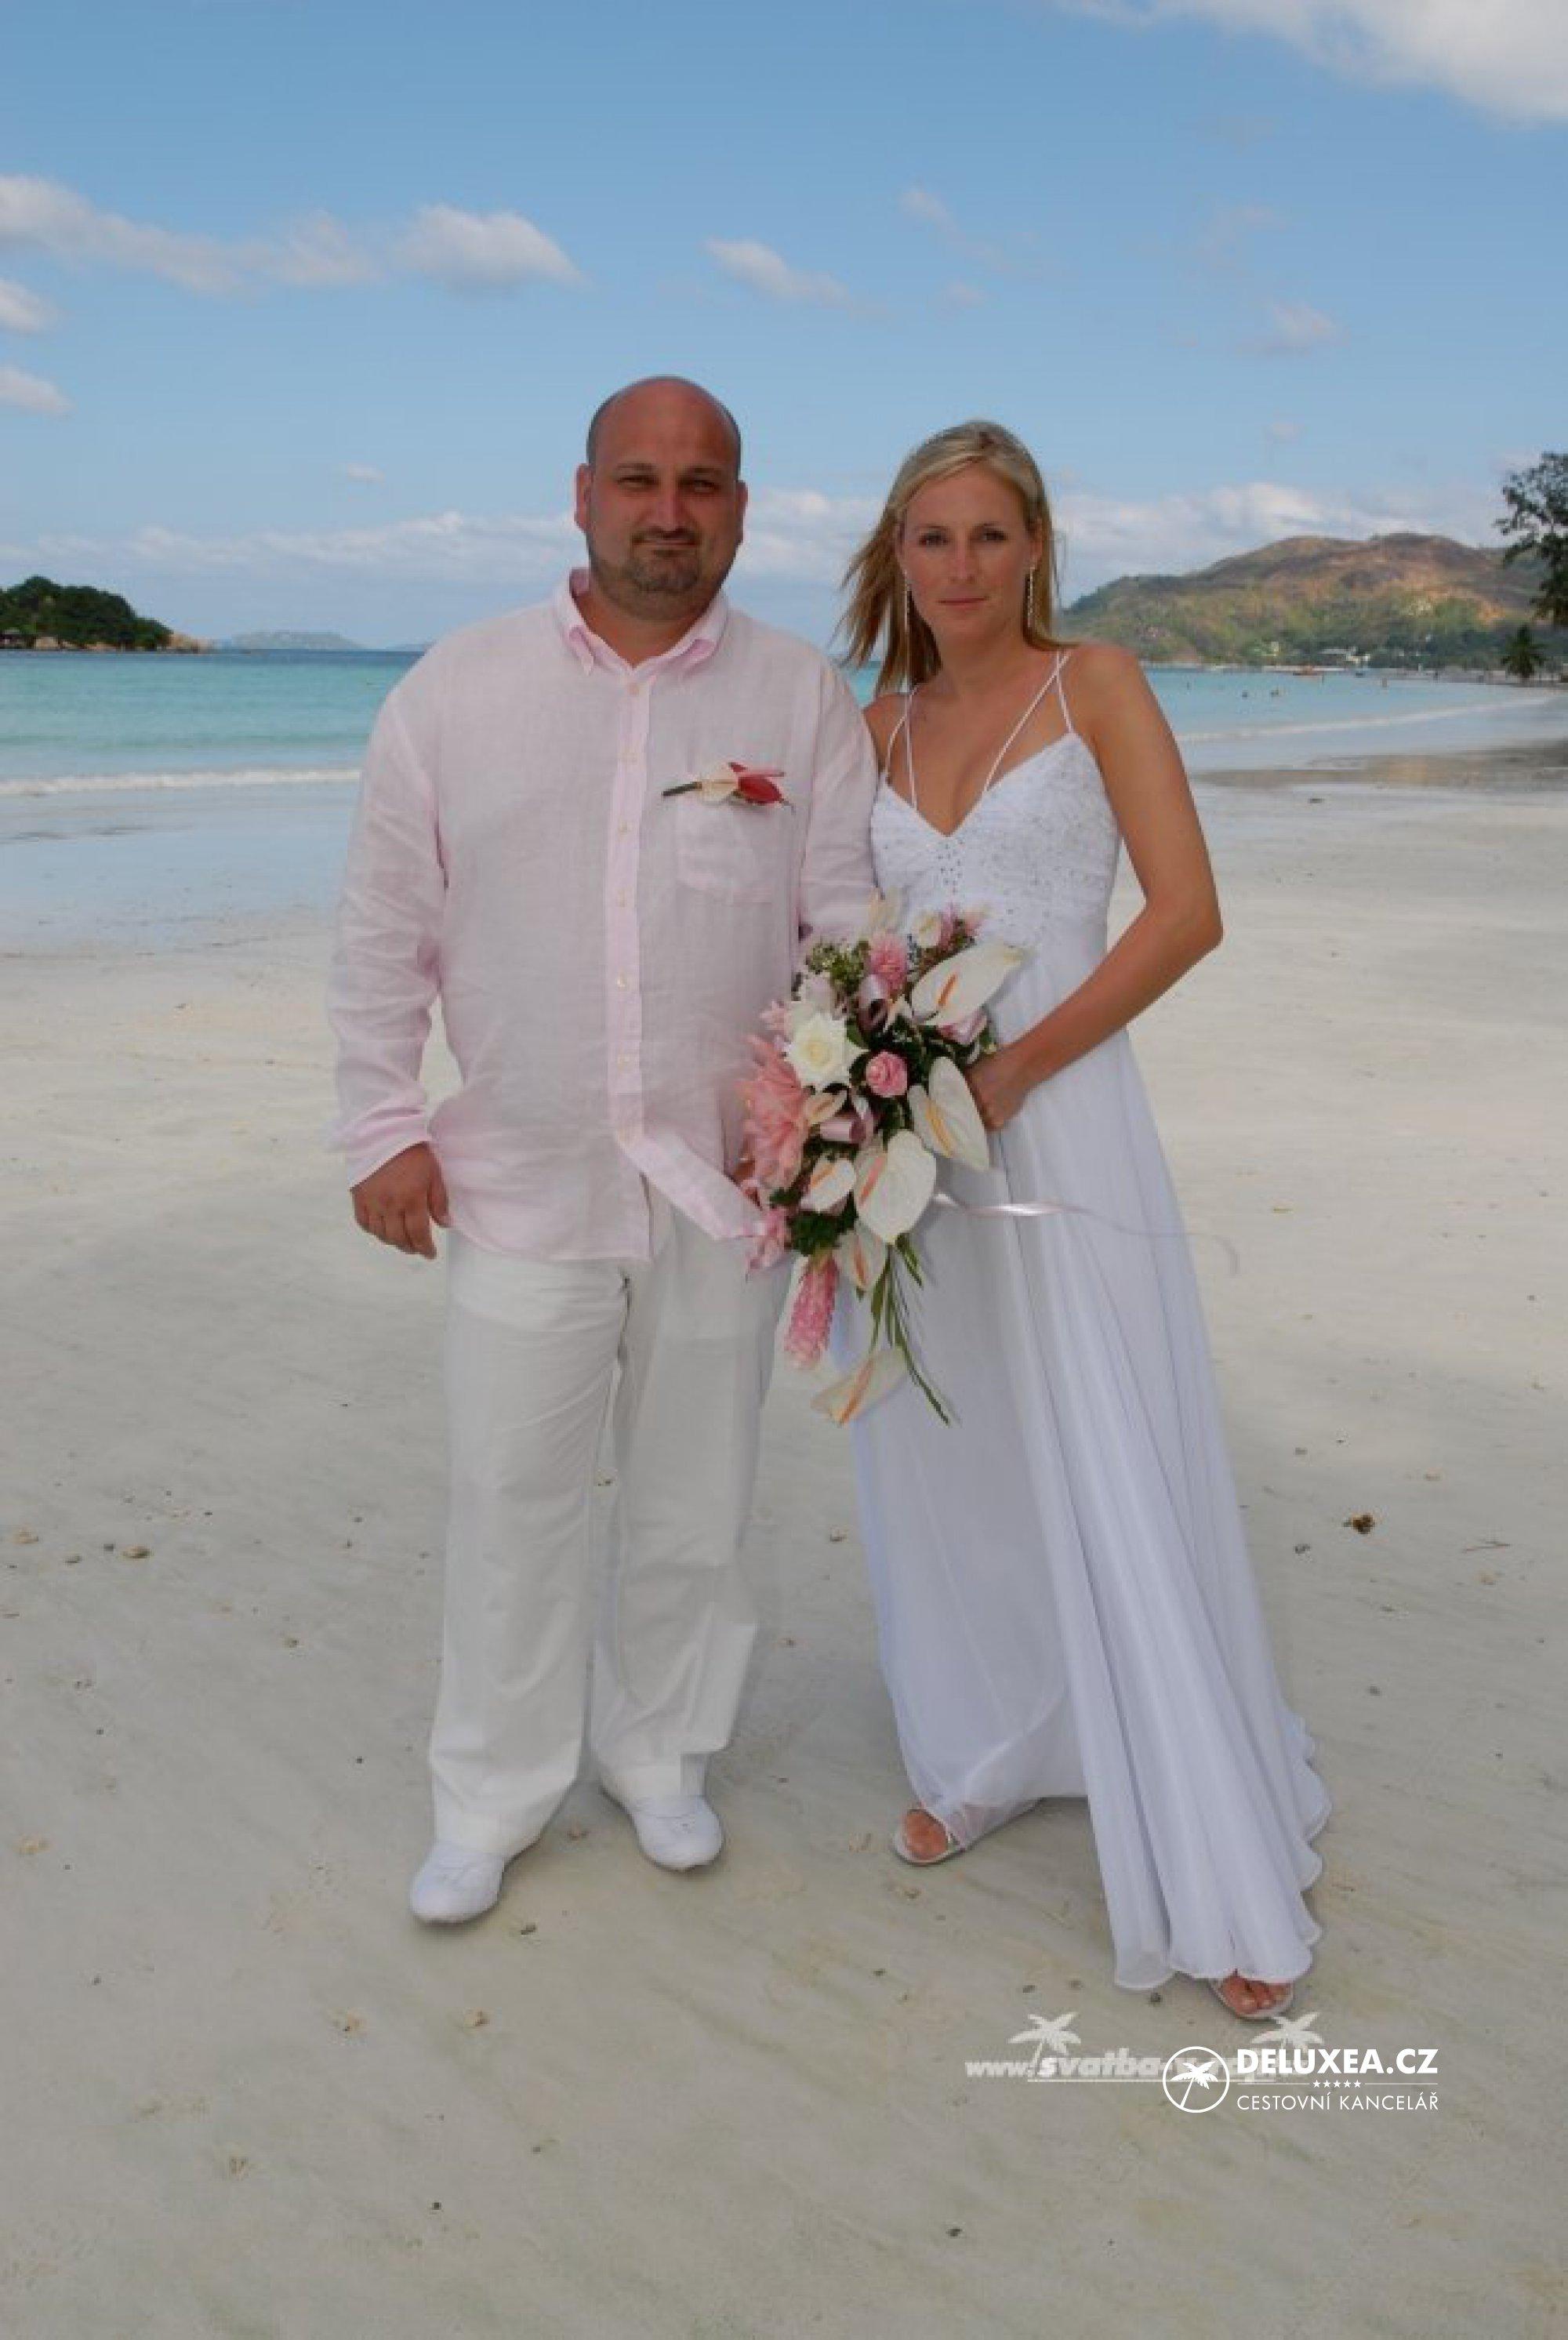 00c87c51eac Svatební šaty. Inspirace pro svatbu u moře. - DELUXEA